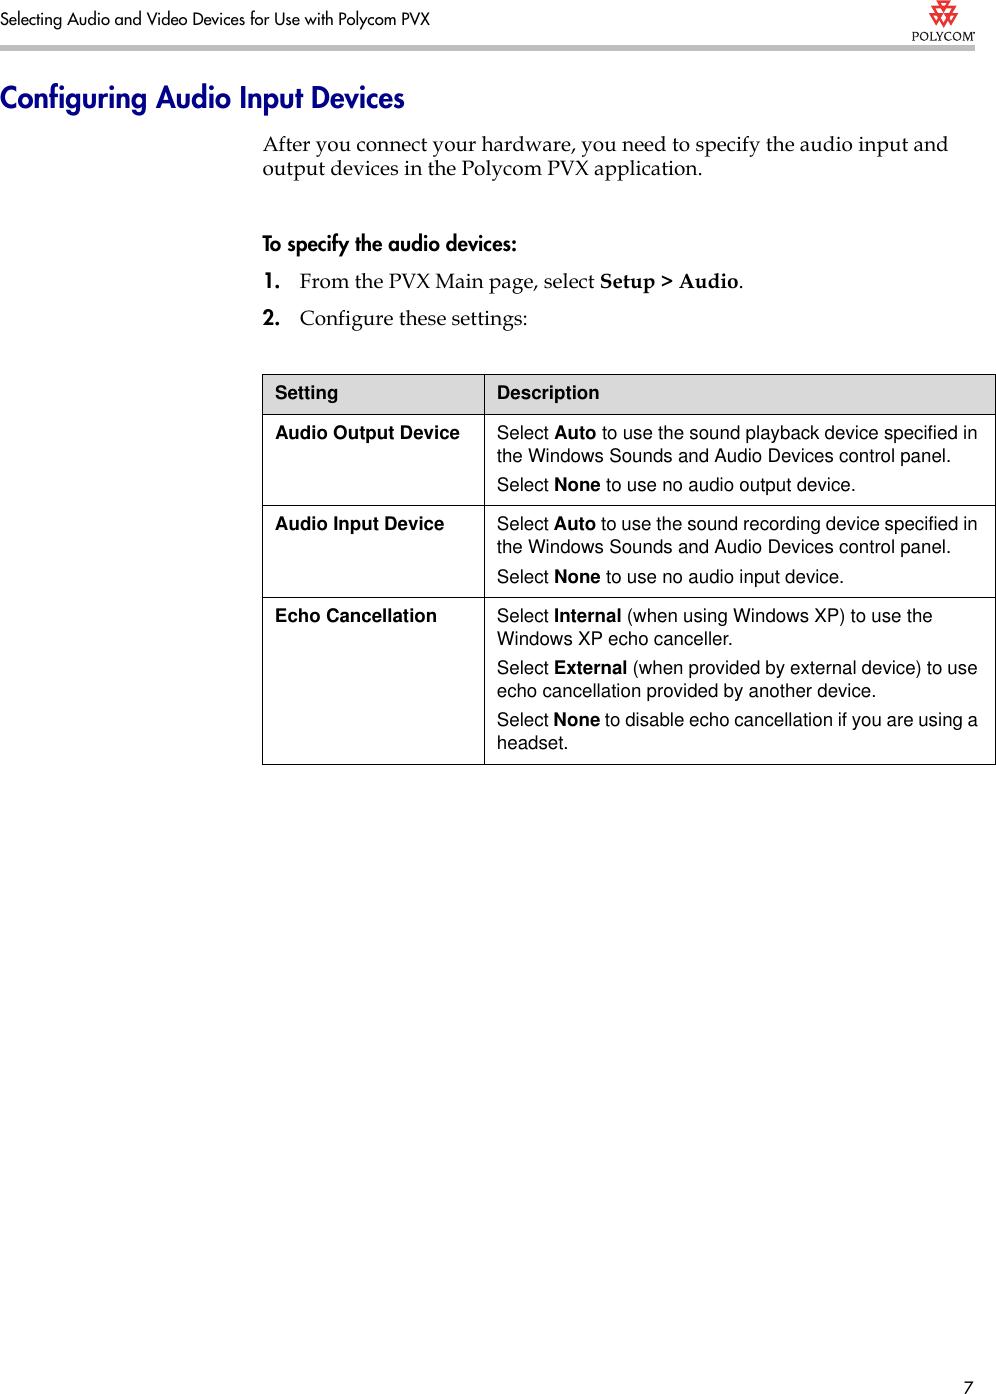 polycom 3725 22724 003 a users manual pvx selectingaudiodevice 003a rh usermanual wiki